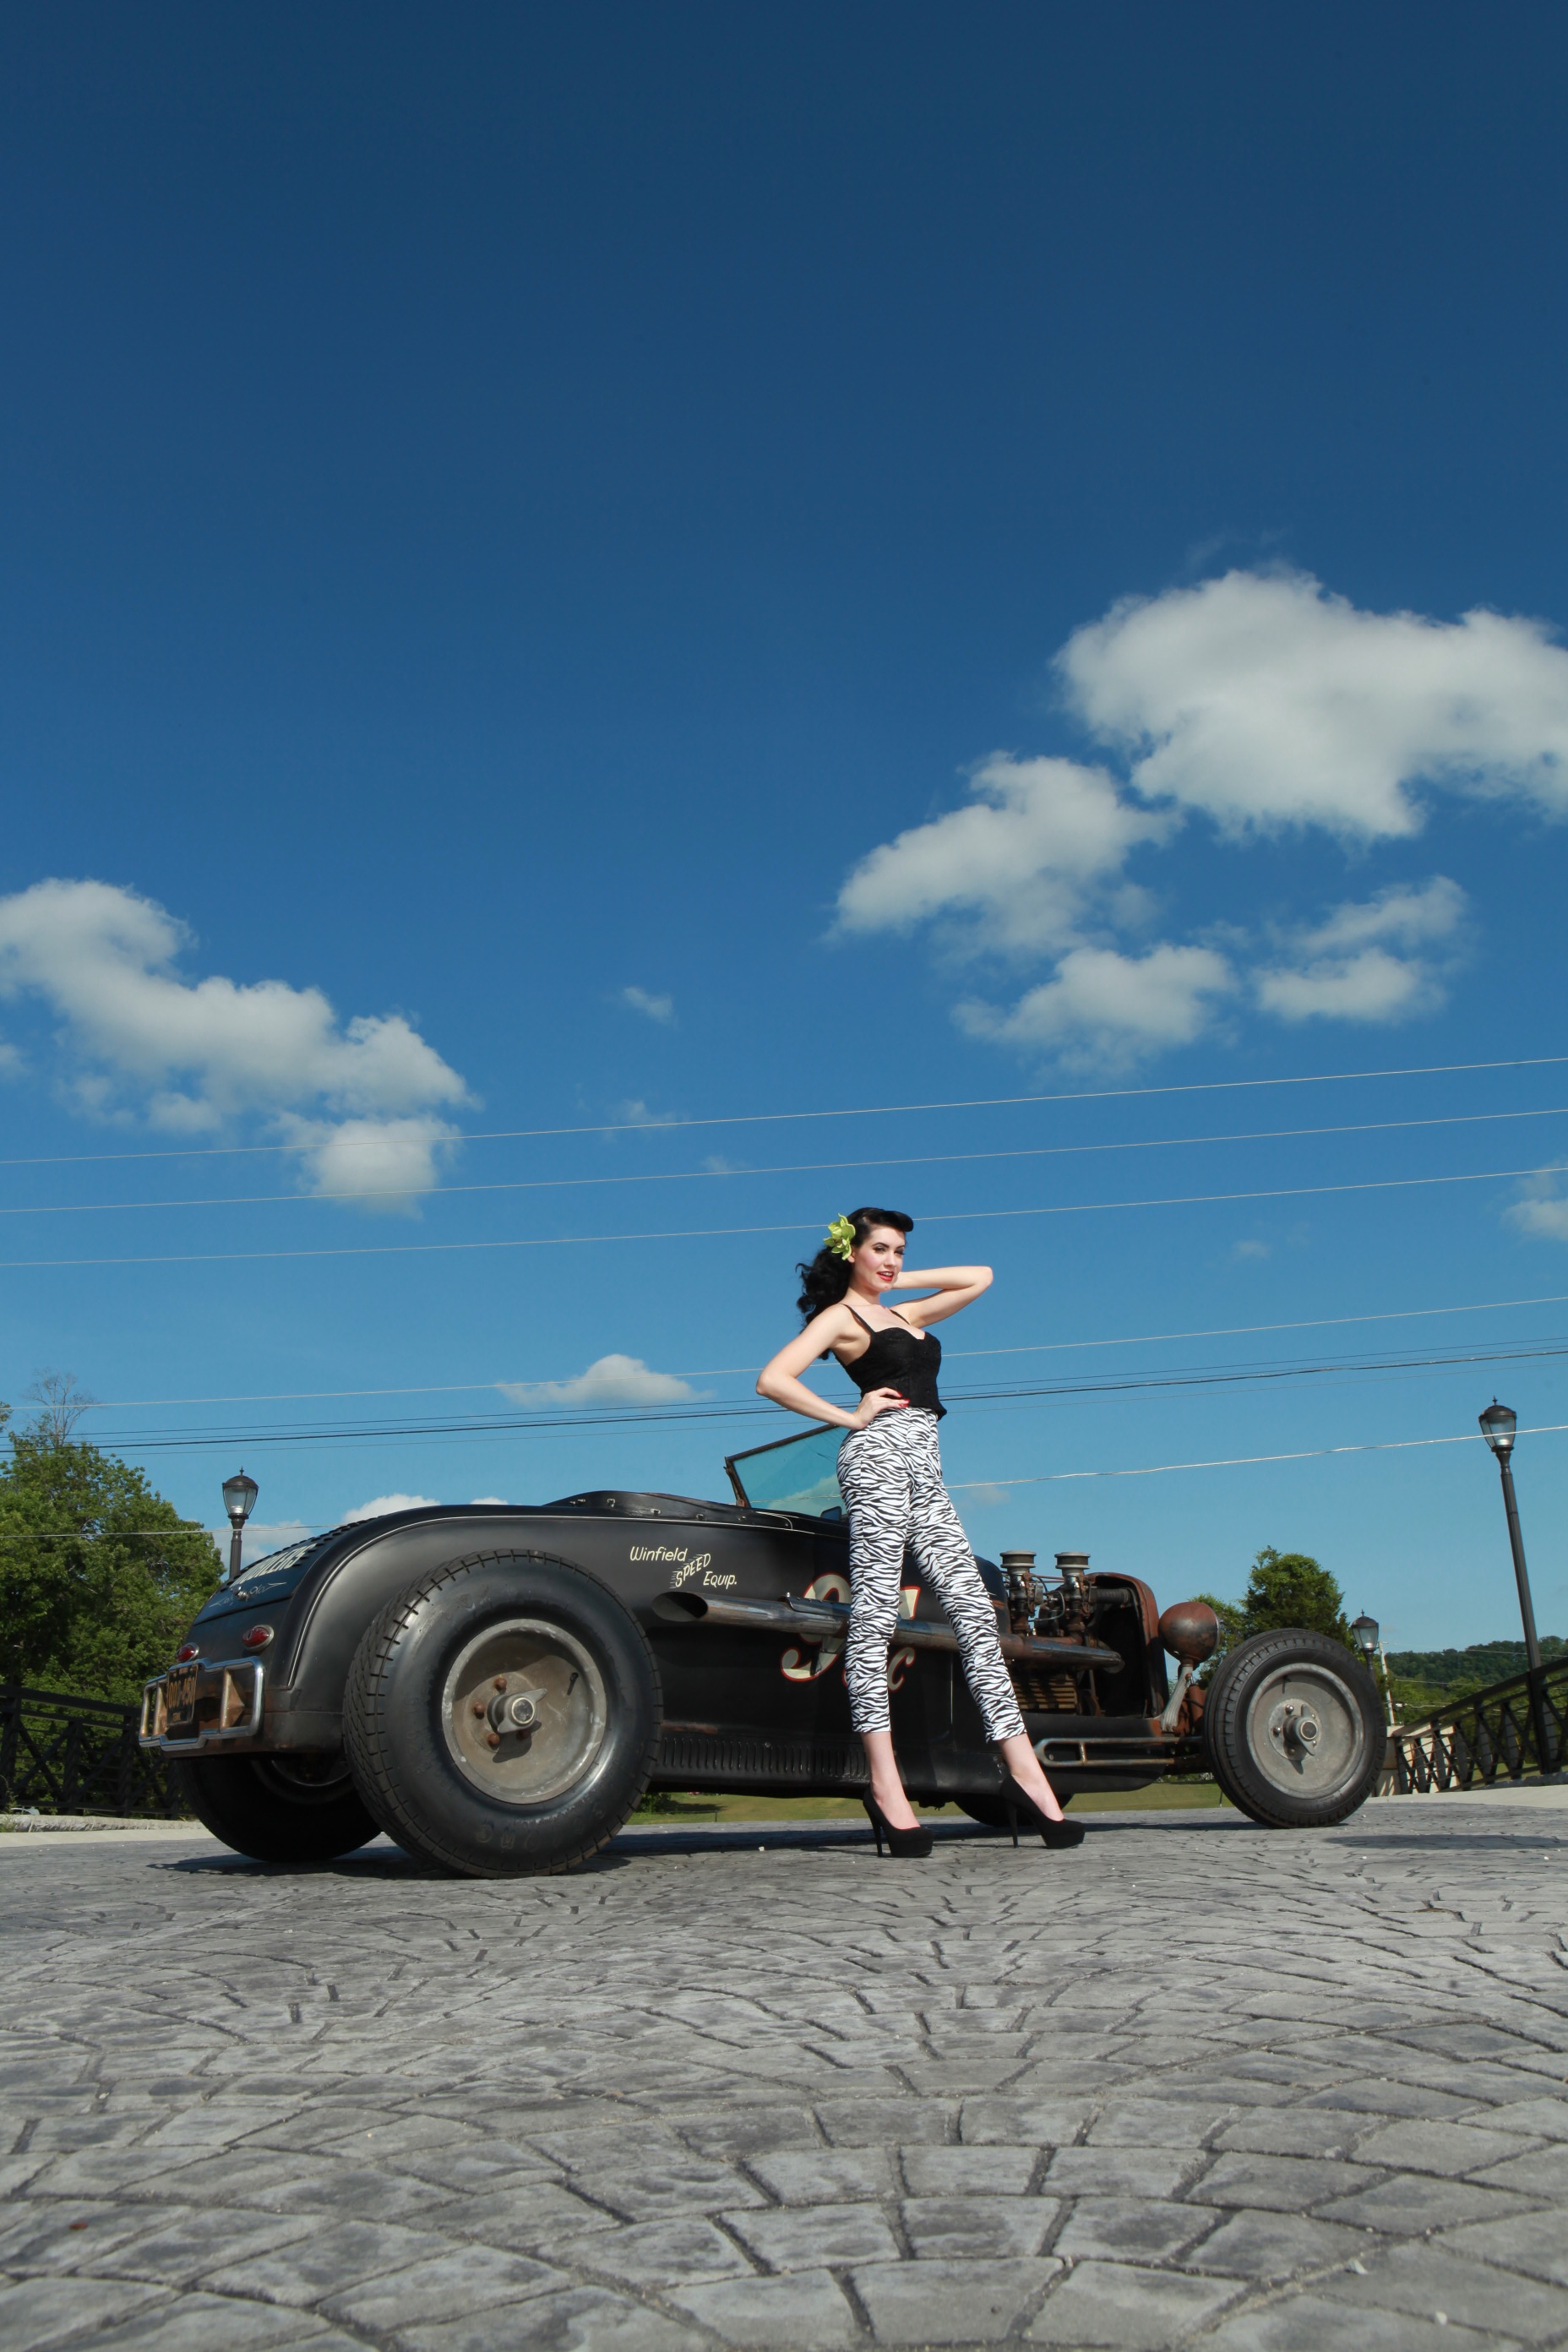 Pinup of the Week: BrittanyJean